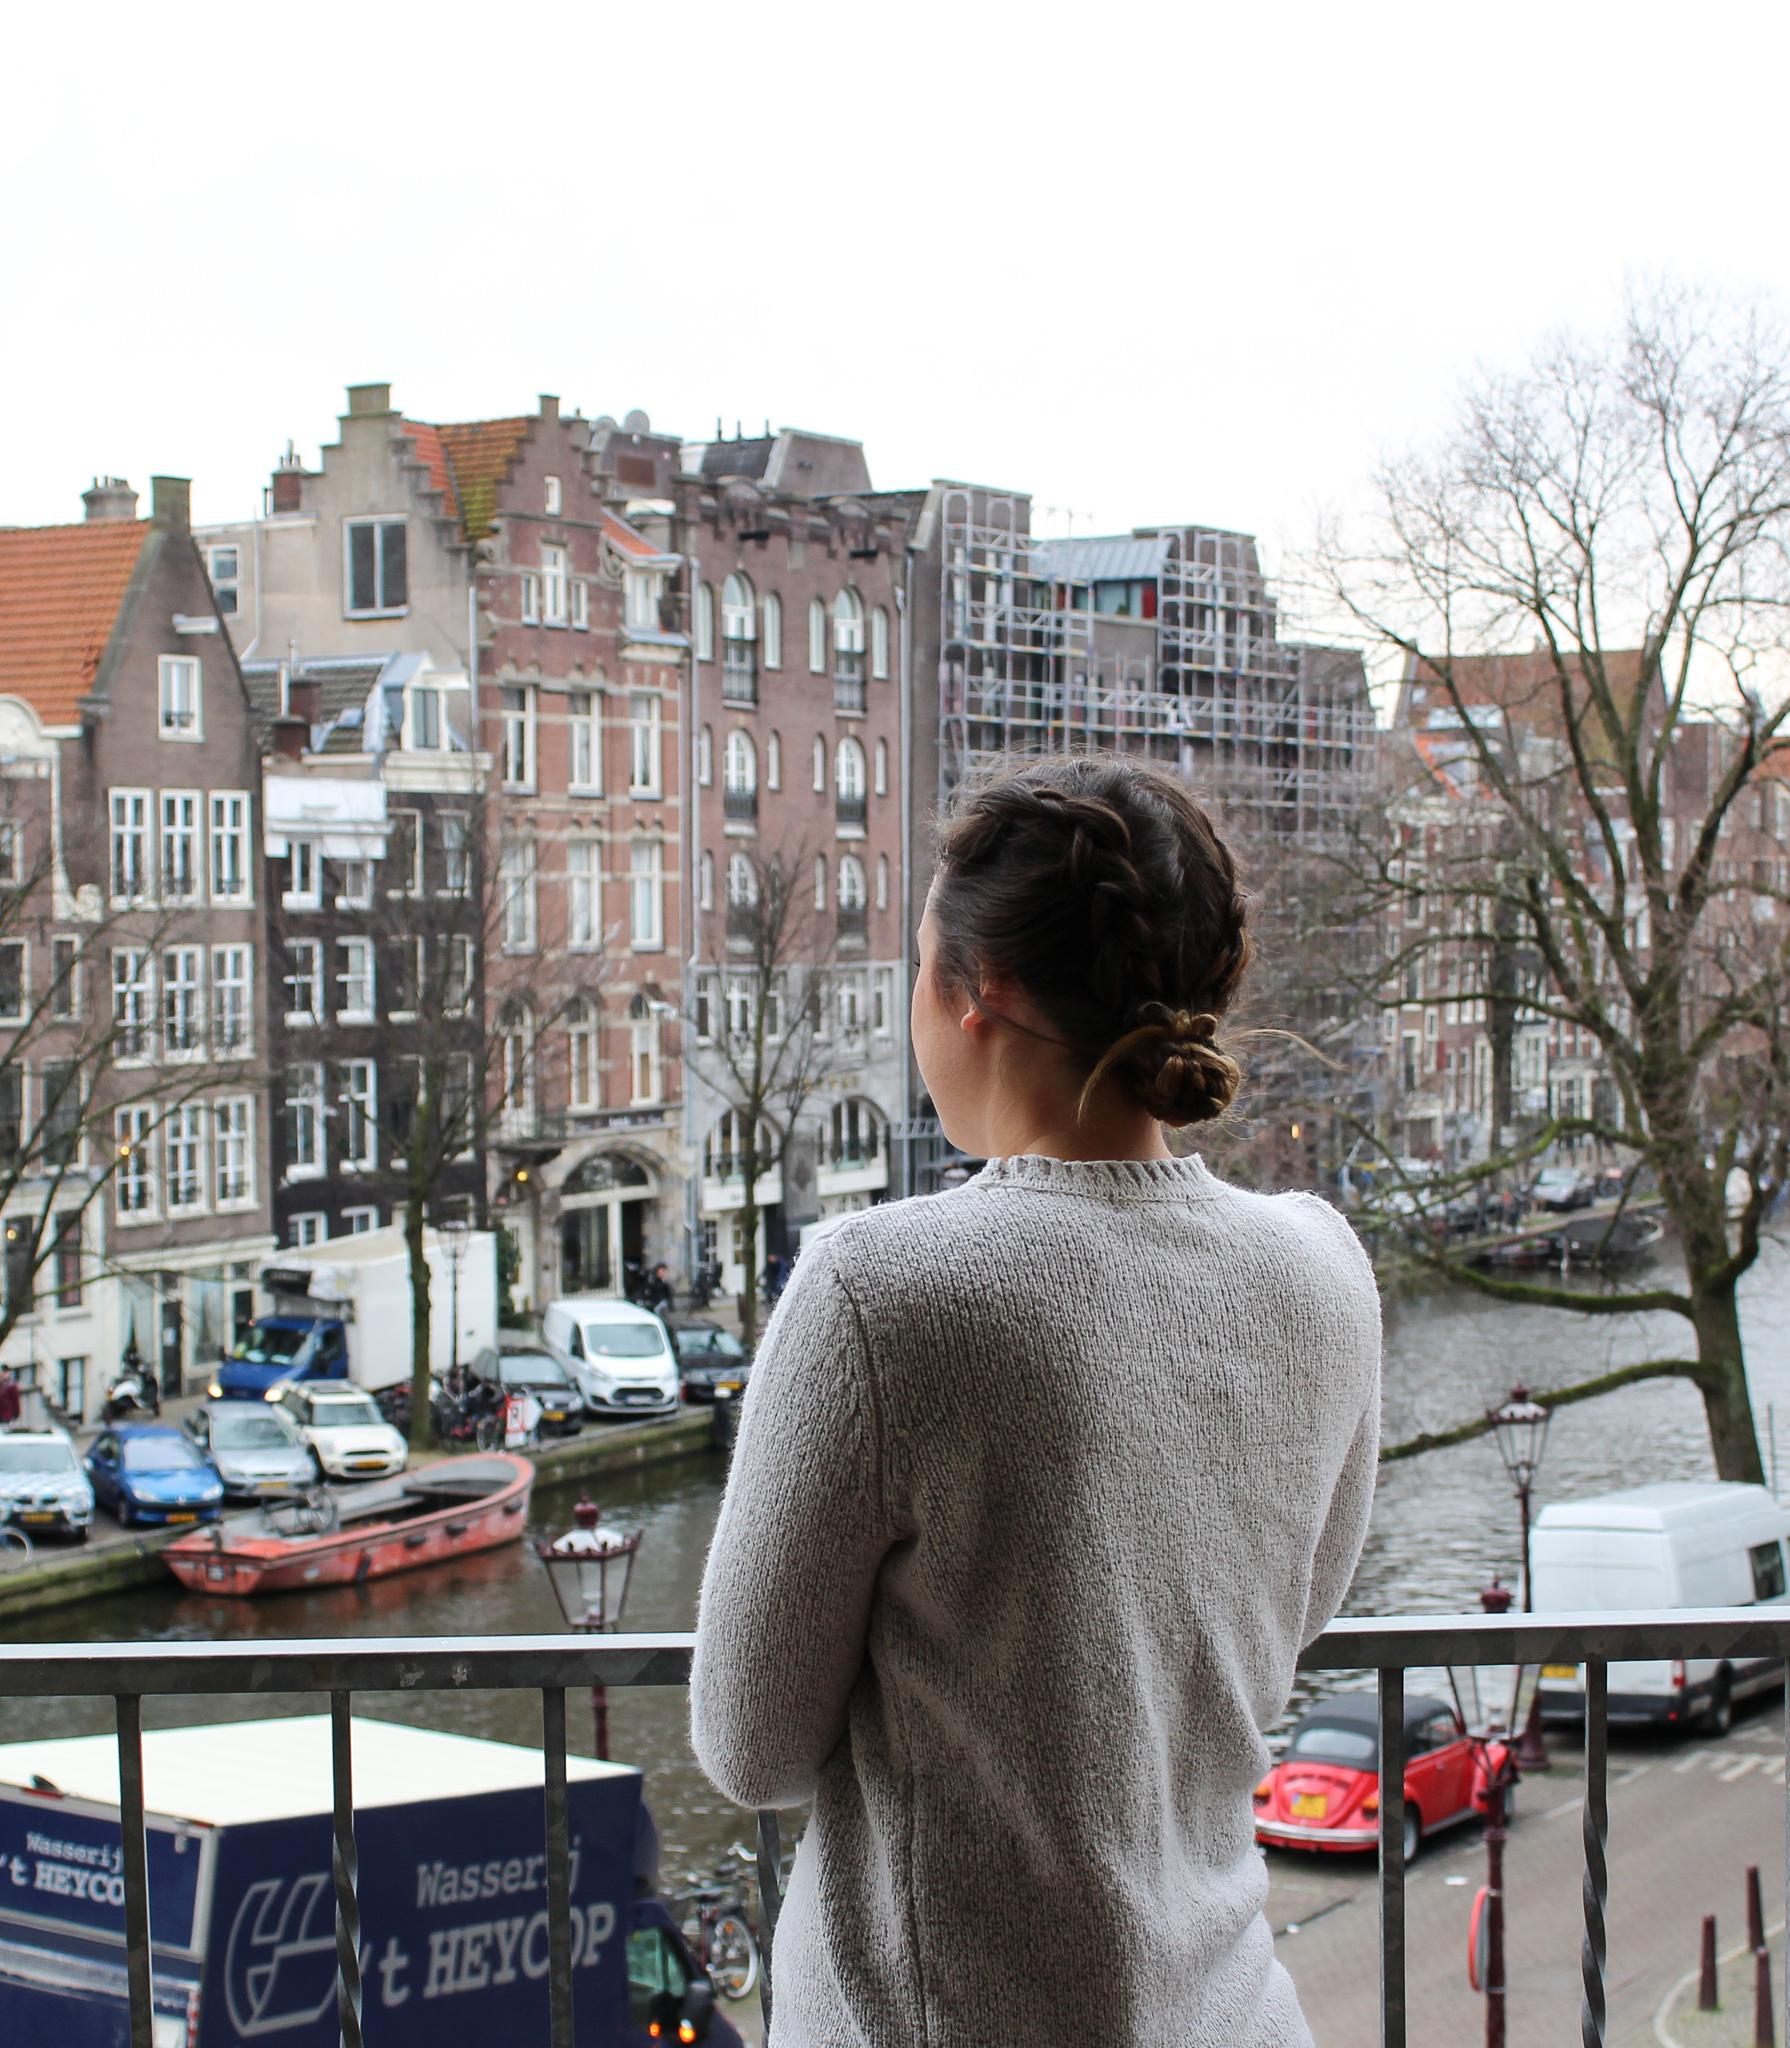 Hotel Wiechmann in Amsterdam, Netherlands